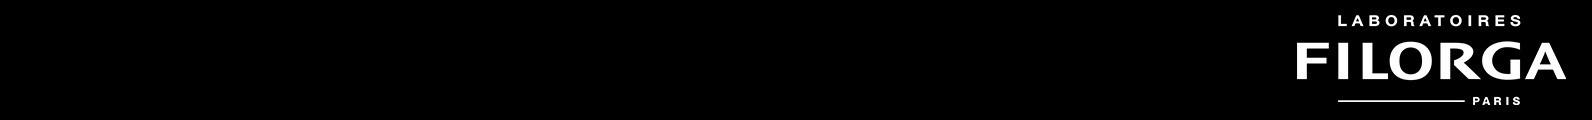 filorga